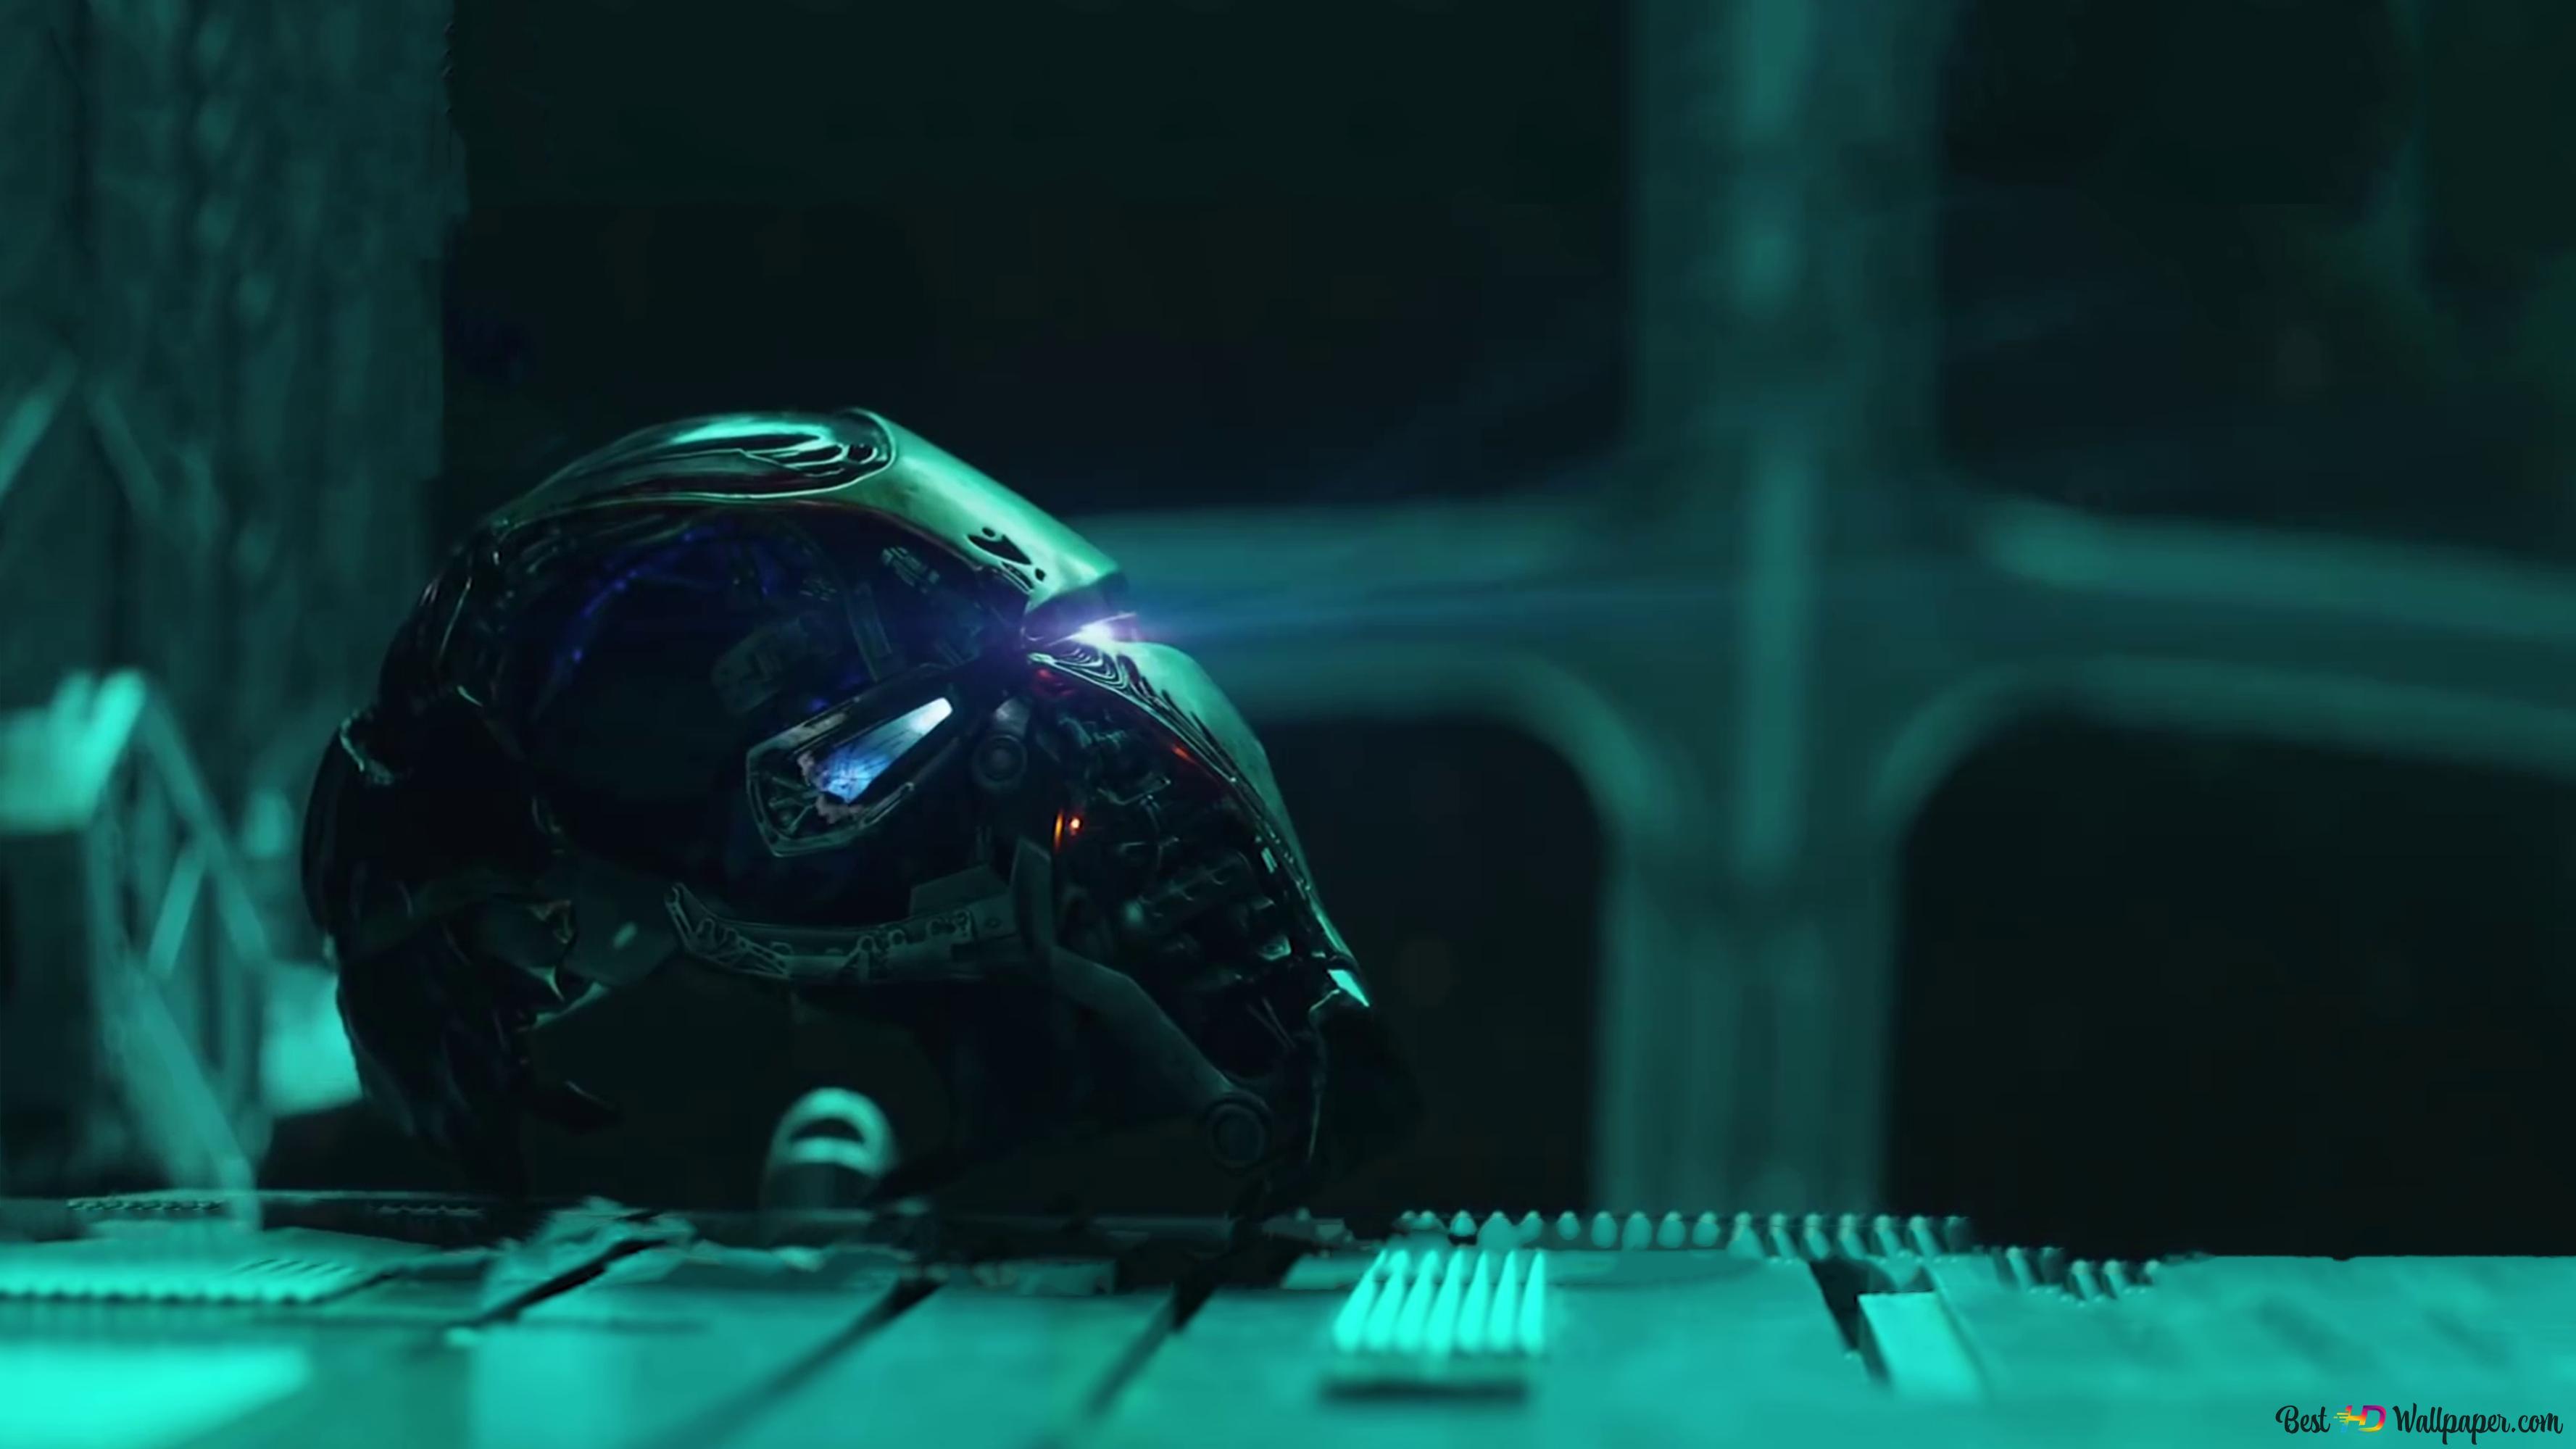 Avengers Endgame Iron Man Rotto Casco Download Di Sfondi Hd